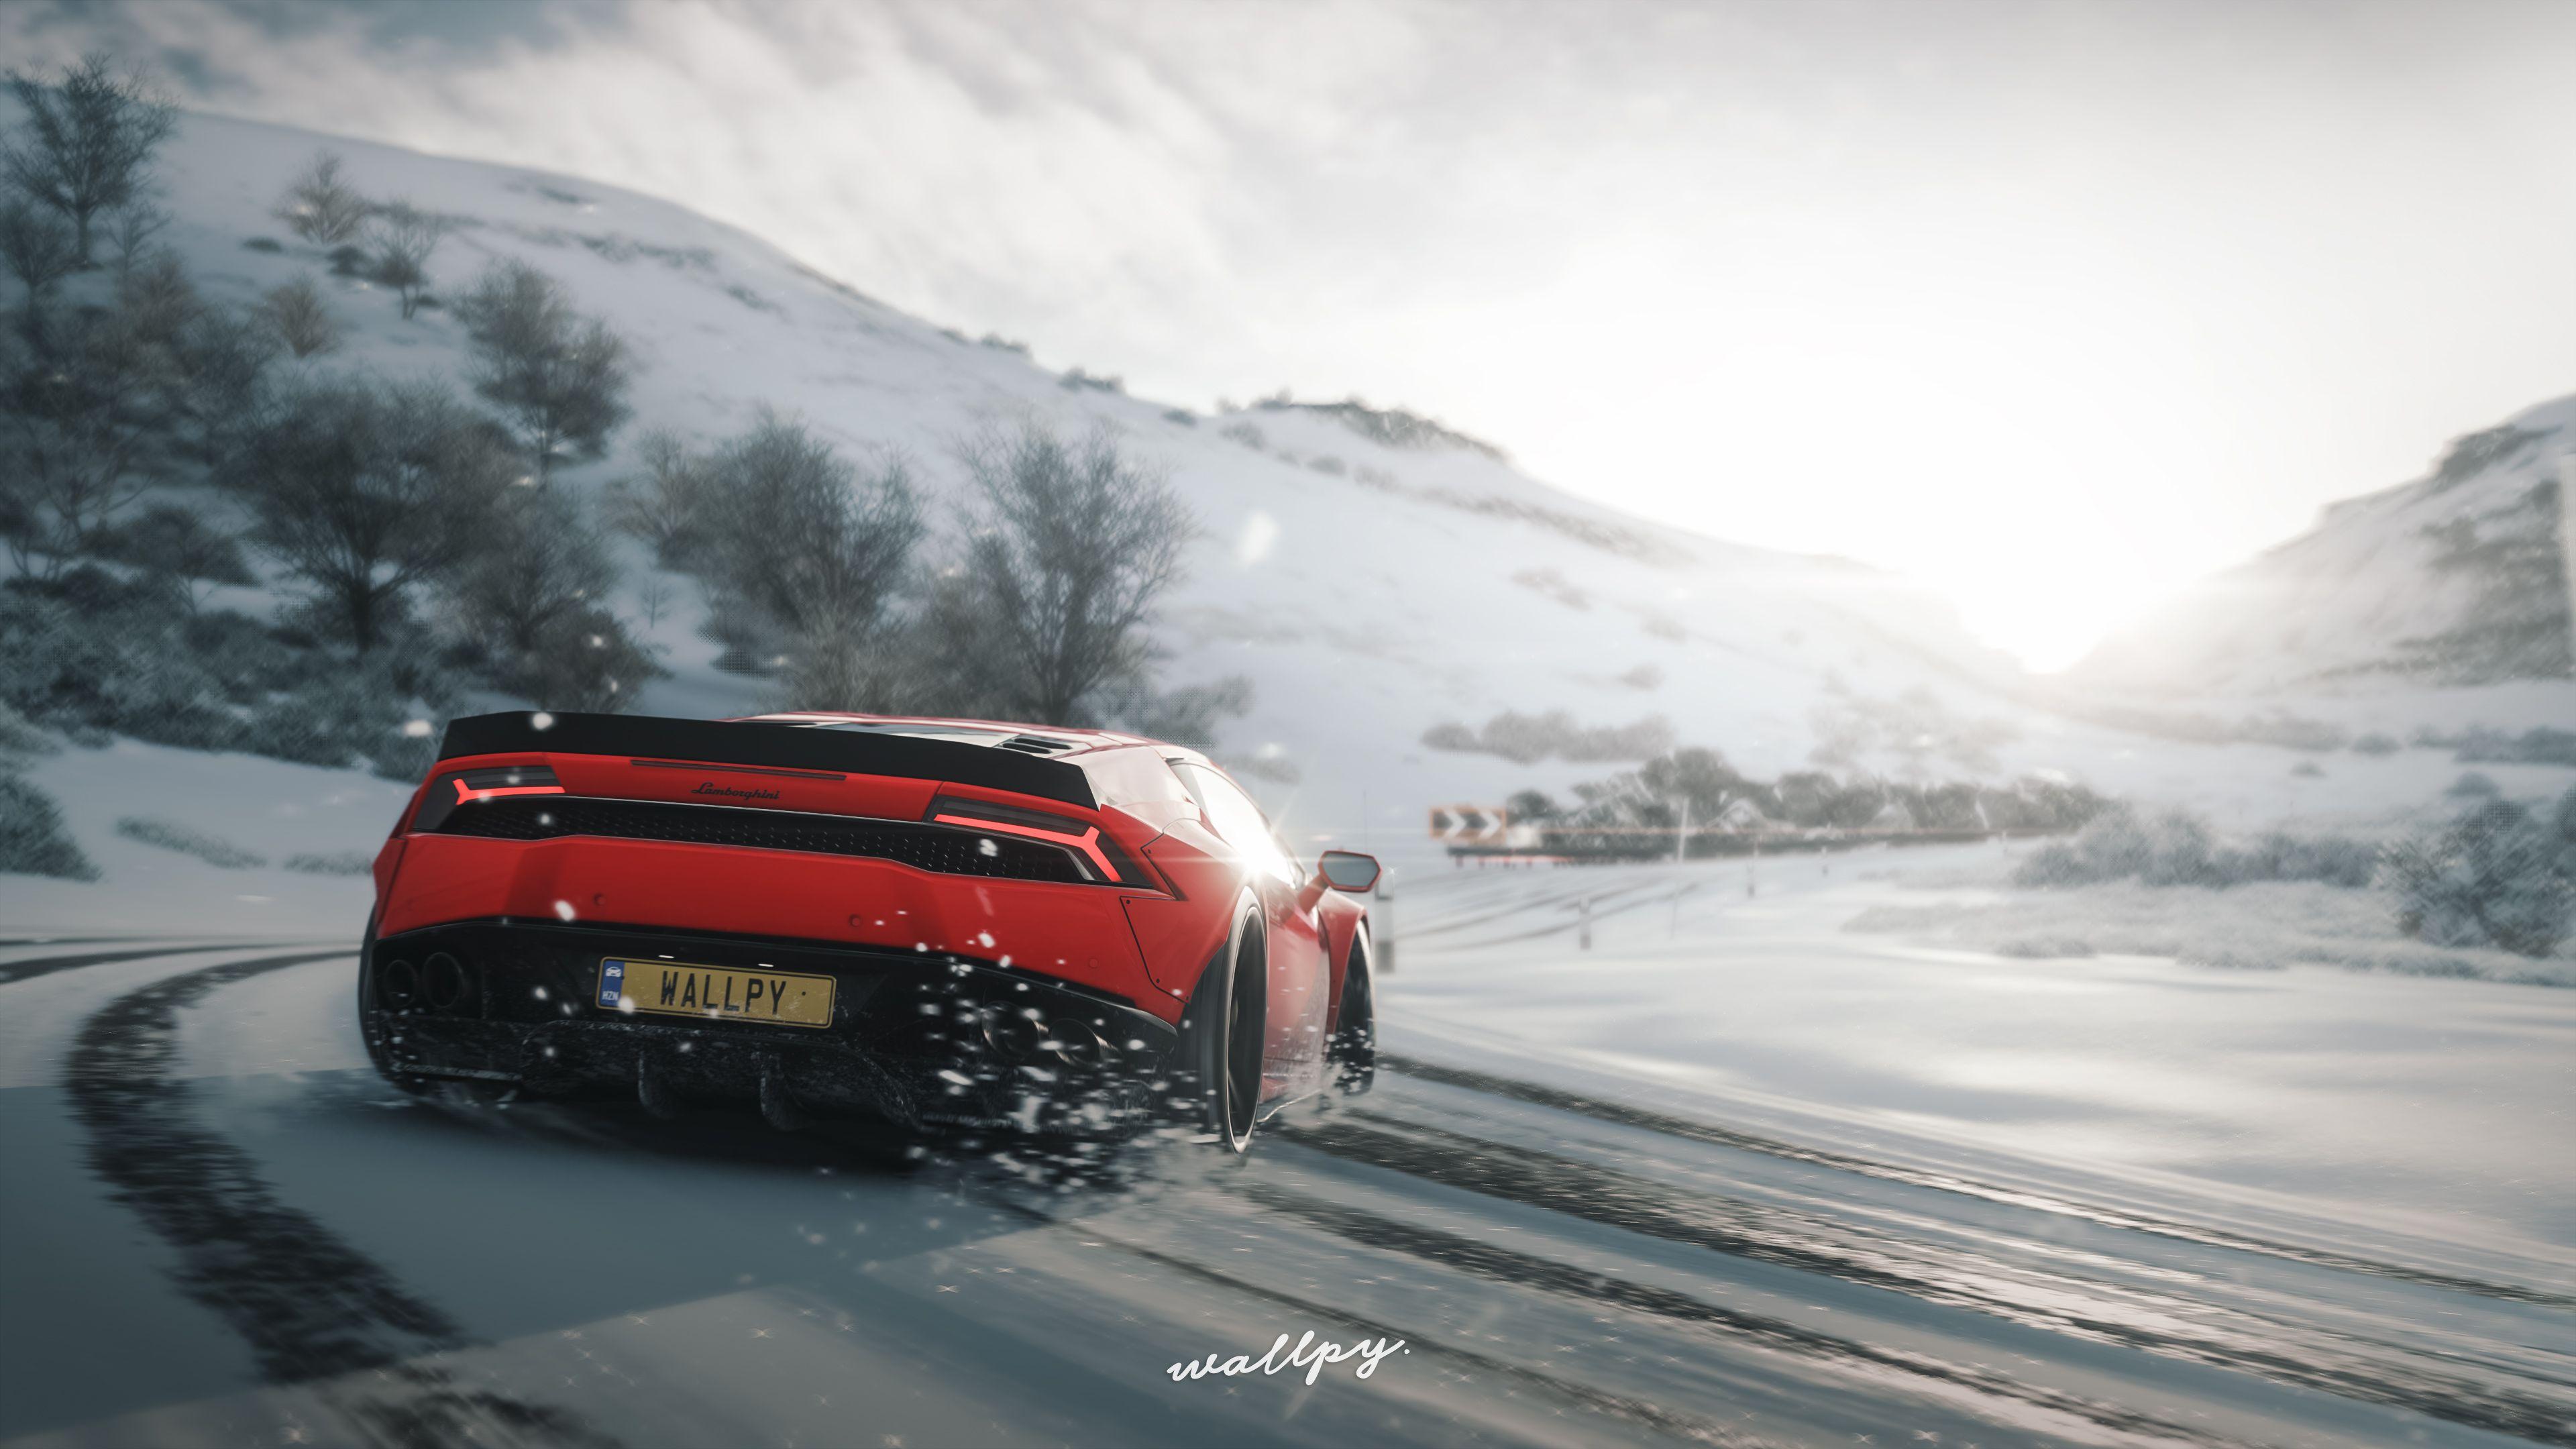 Wallpaper 4k Lamborghini Huracan Drift In Snow Forza Horizon 4 4k